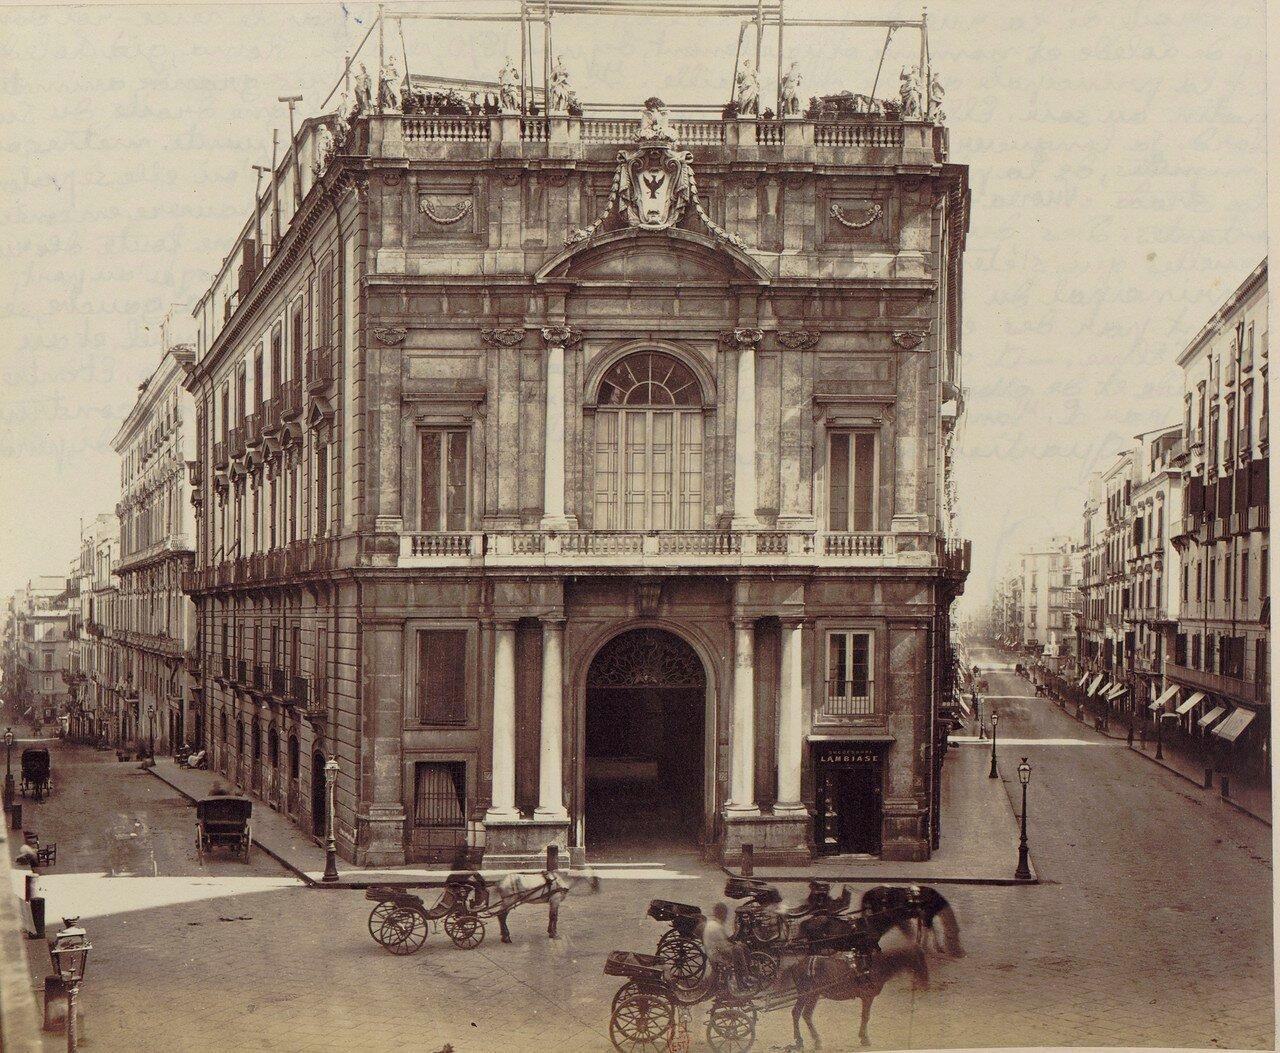 34. Улица Толедо и Палаццо Дория д'Ангри